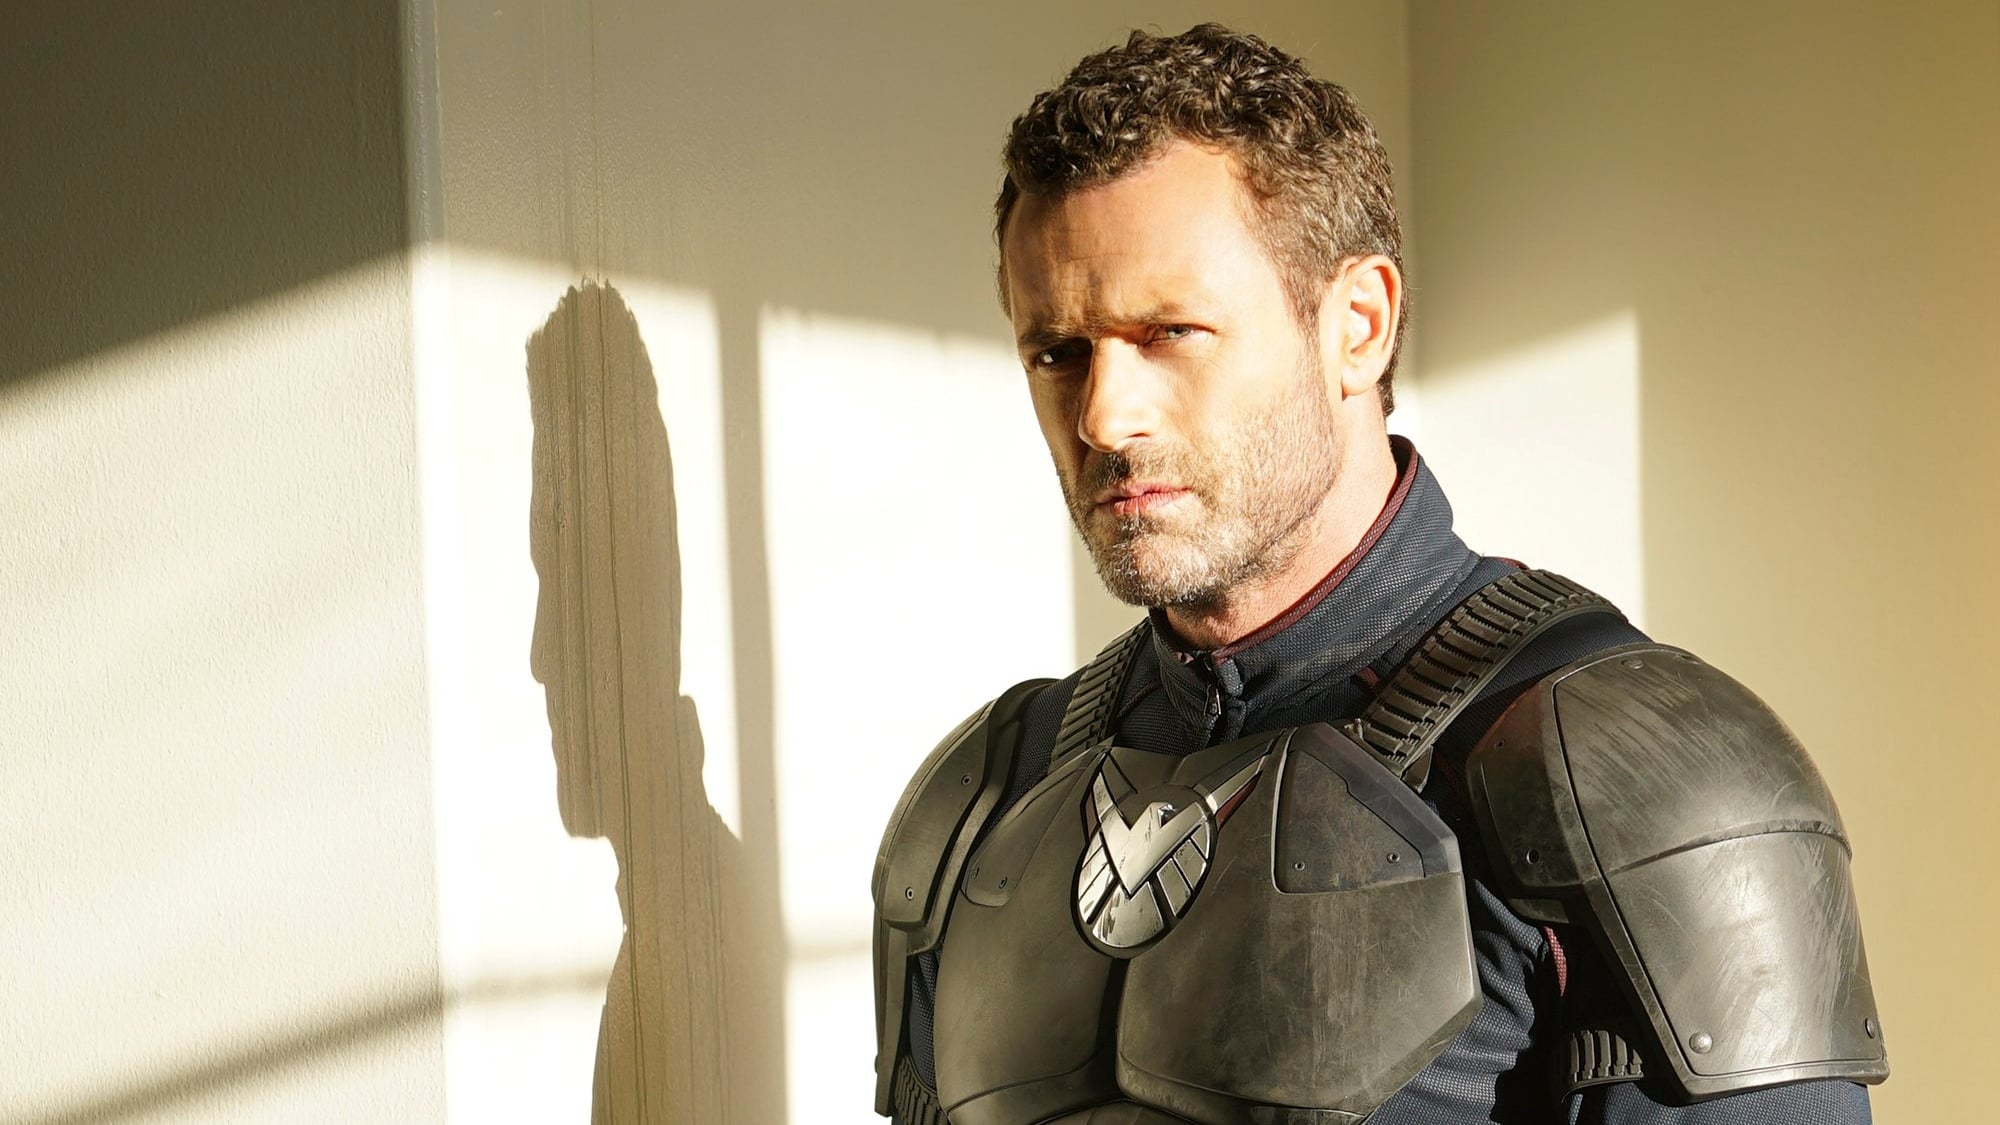 Marvel s Agents of S.H.I.E.L.D. • S04E18